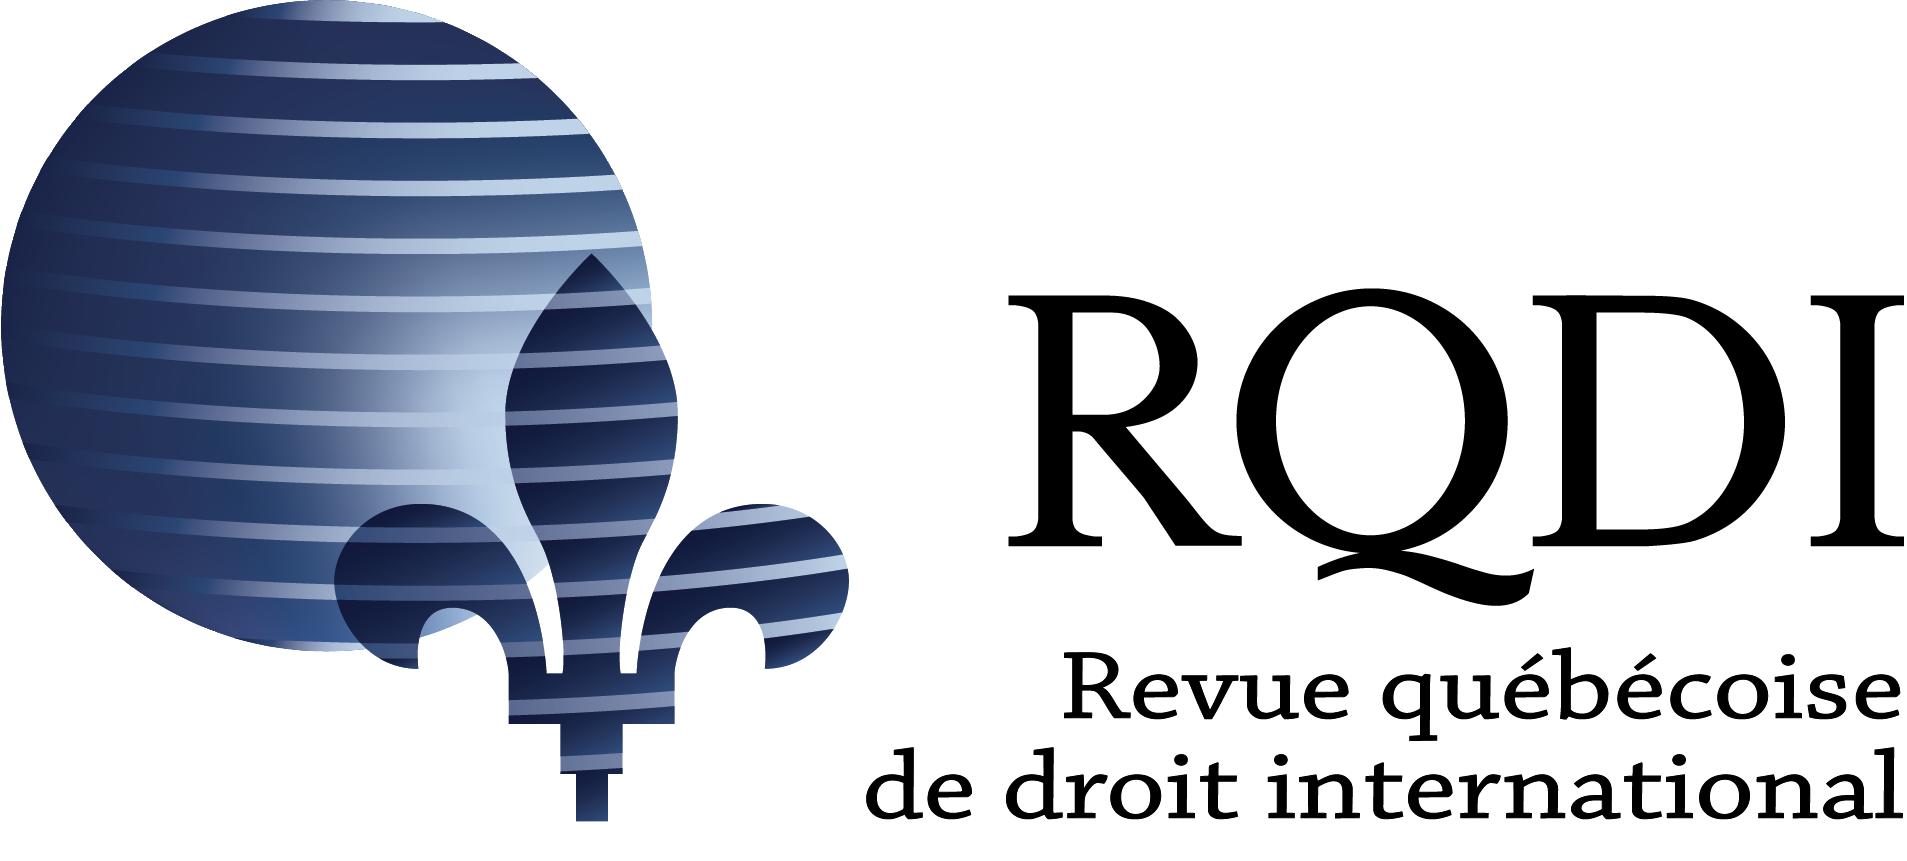 Vignette RQDI